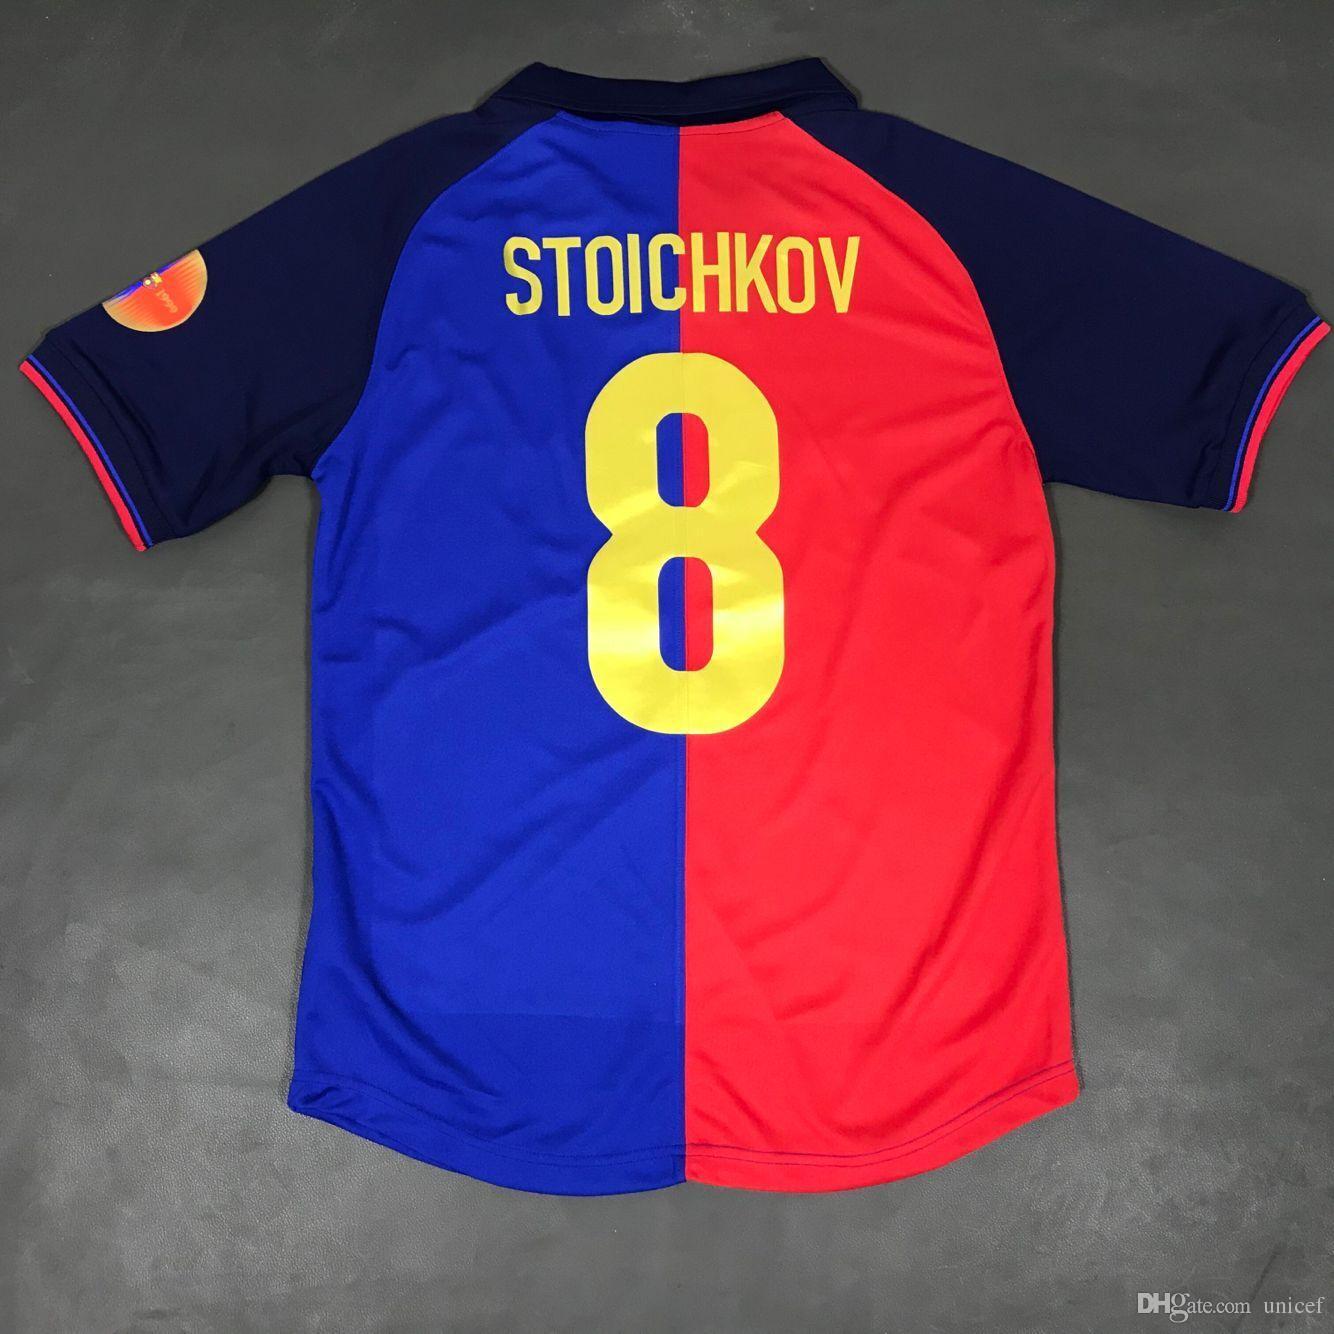 8d06d8afa89 2019 Hristo Stoichkov Red And Blue 1998 1999 Retro Soccer Jerseys 100 Years  Anniversary Edition Football Shirts Camiseta De Fútbol Maillot Maglia From  ...